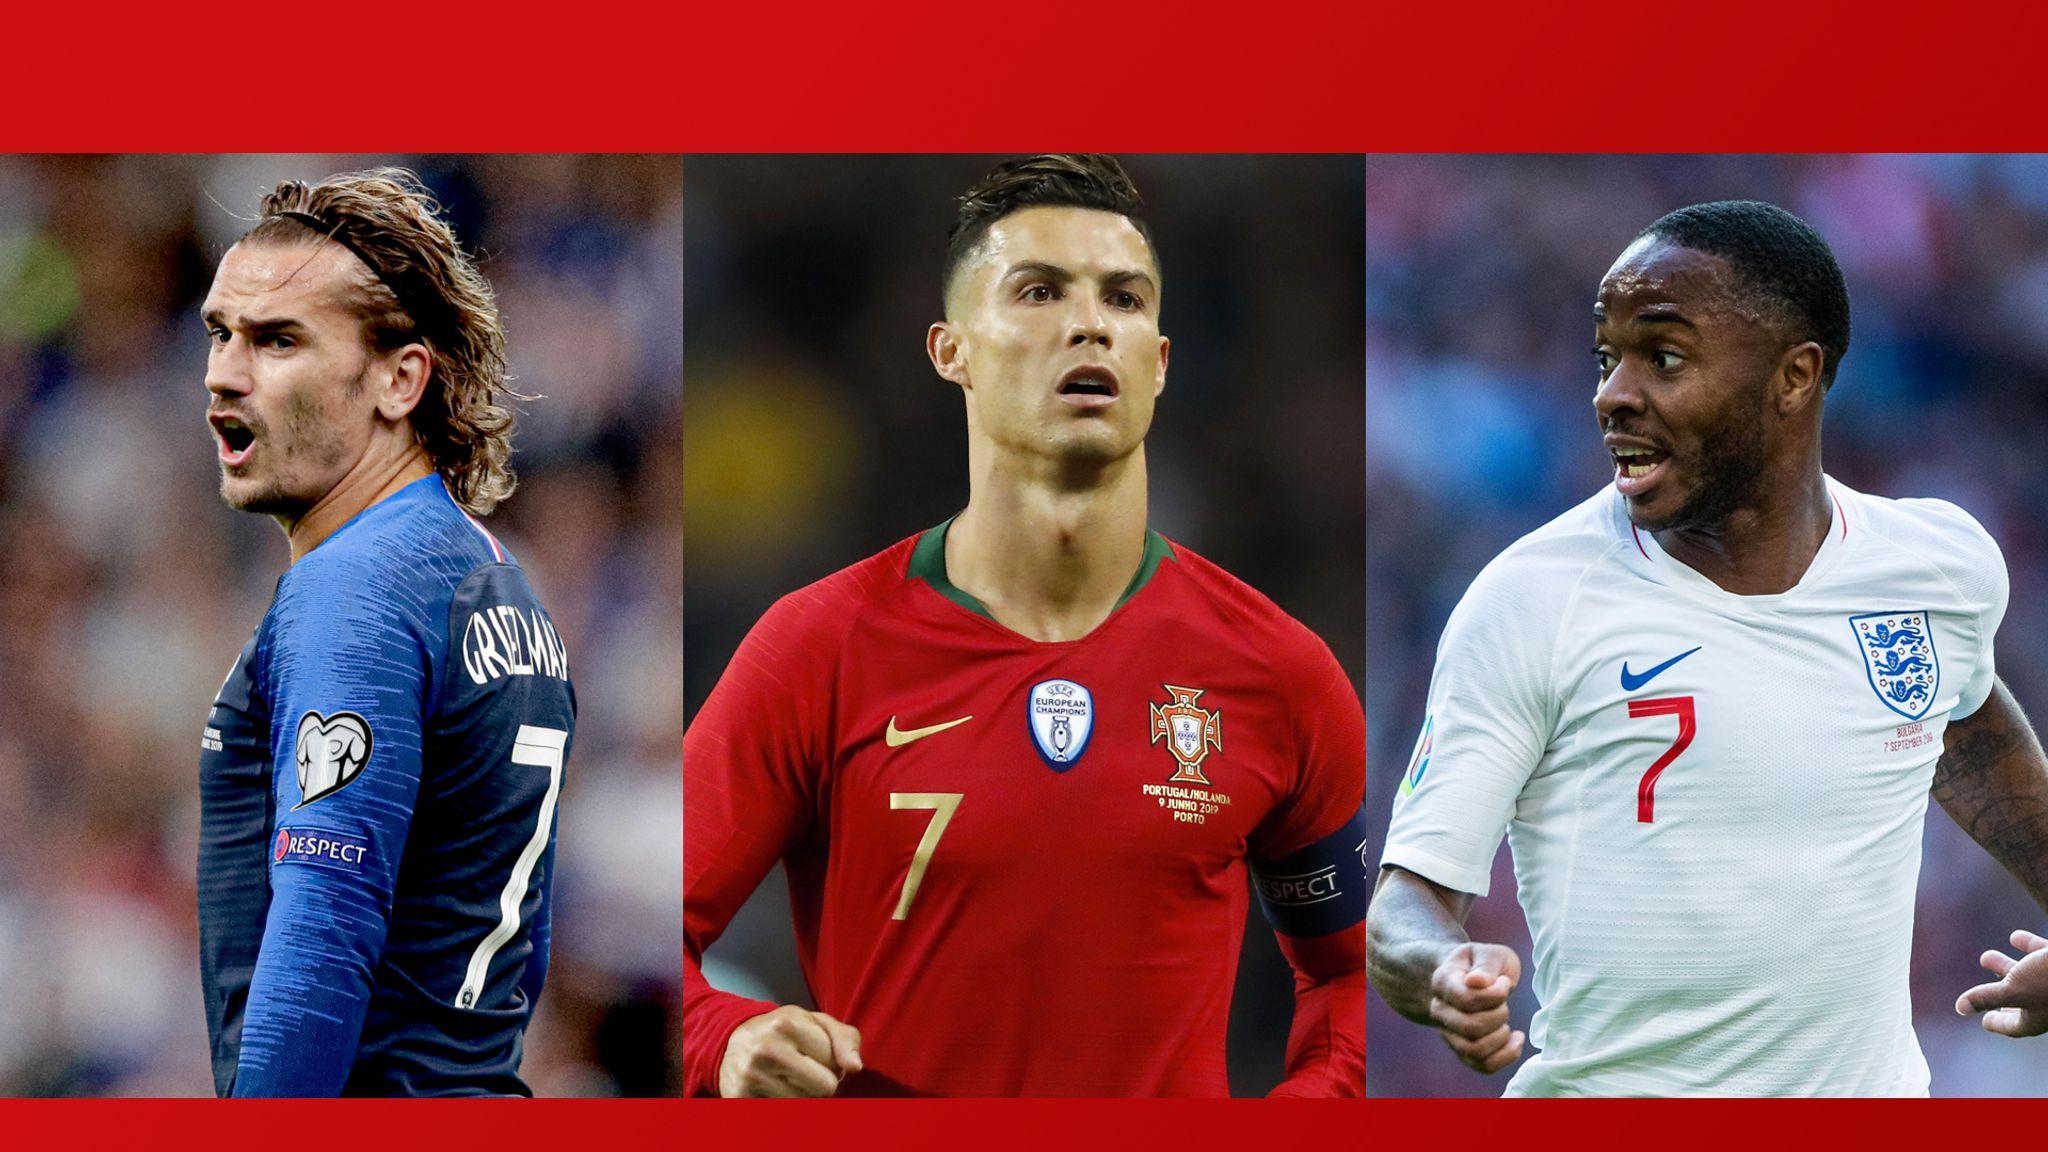 European Qualifiers On Sky Ukraine Vs Portugal France Vs Turkey Football News Sky Sports